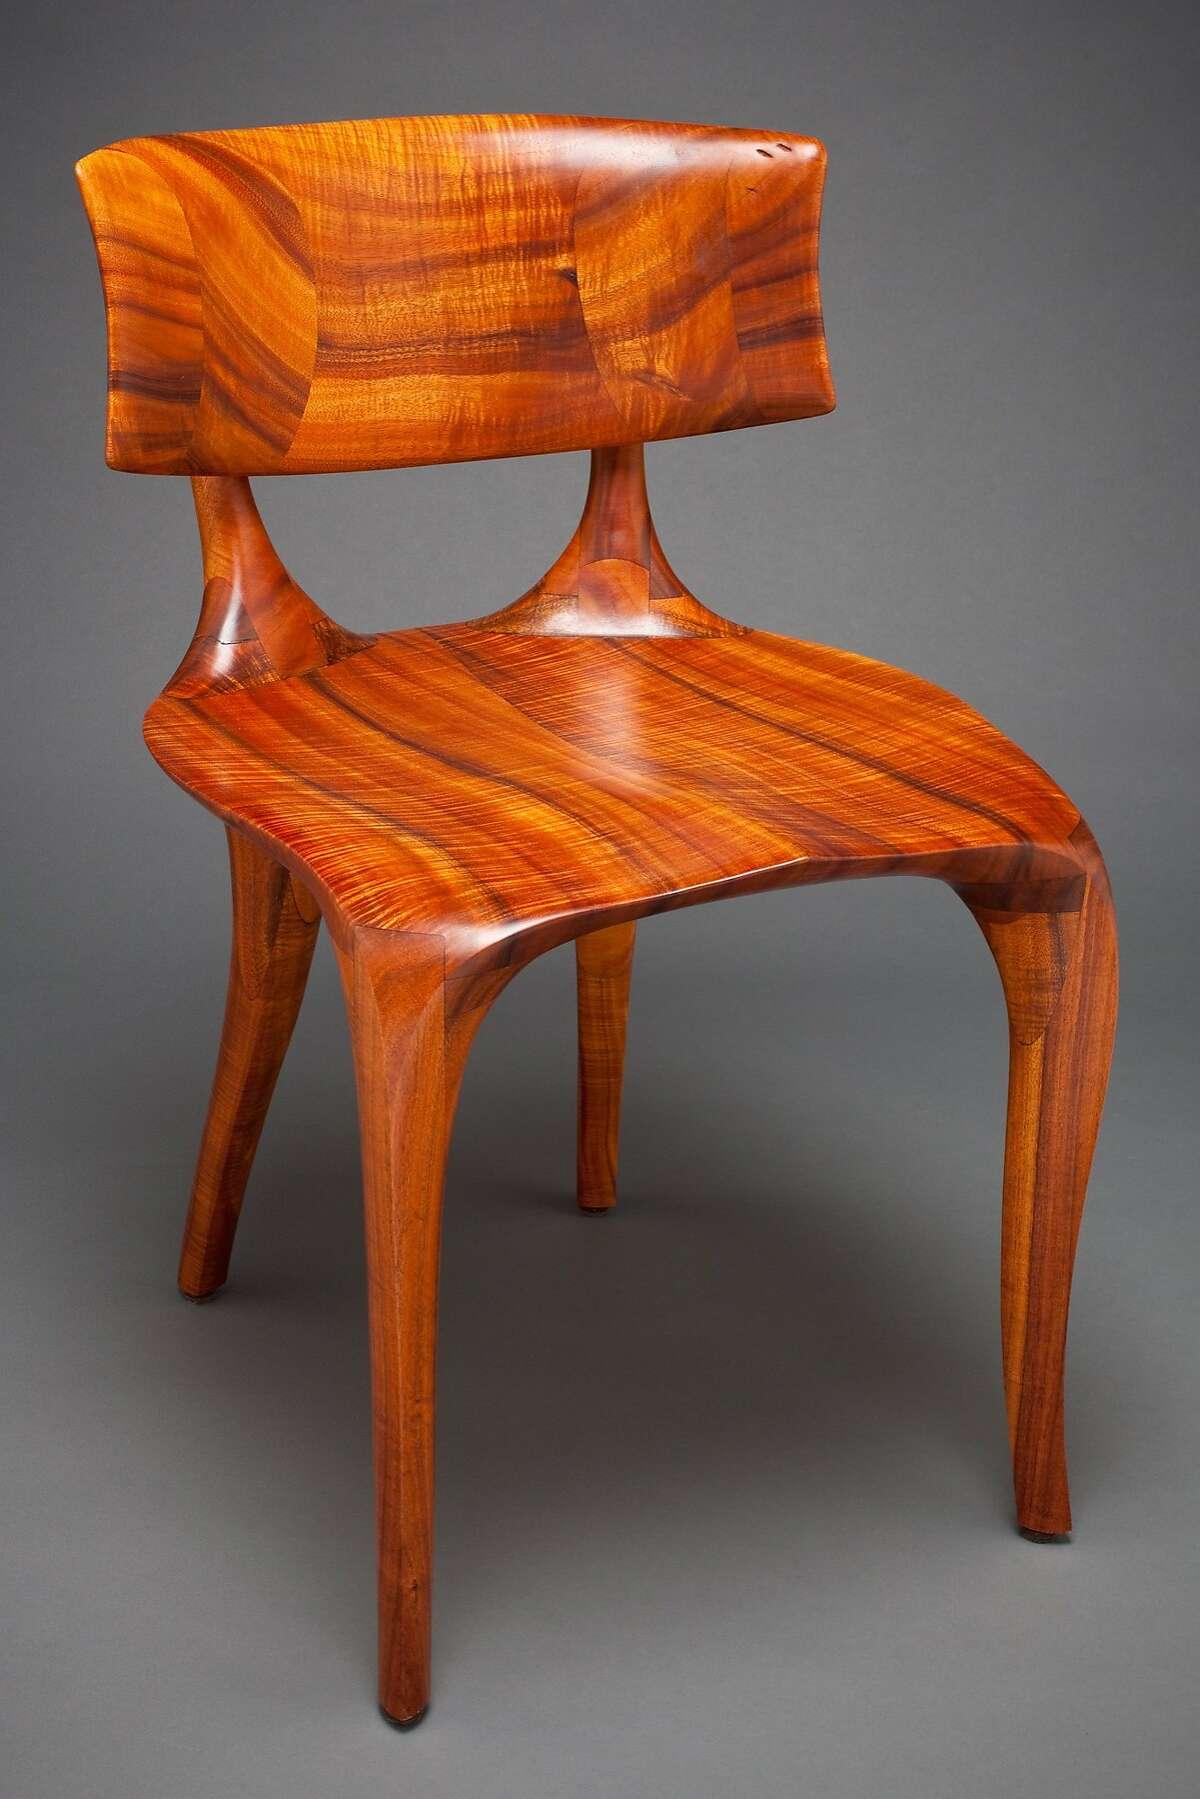 Victor DiNovi's Winston Chair